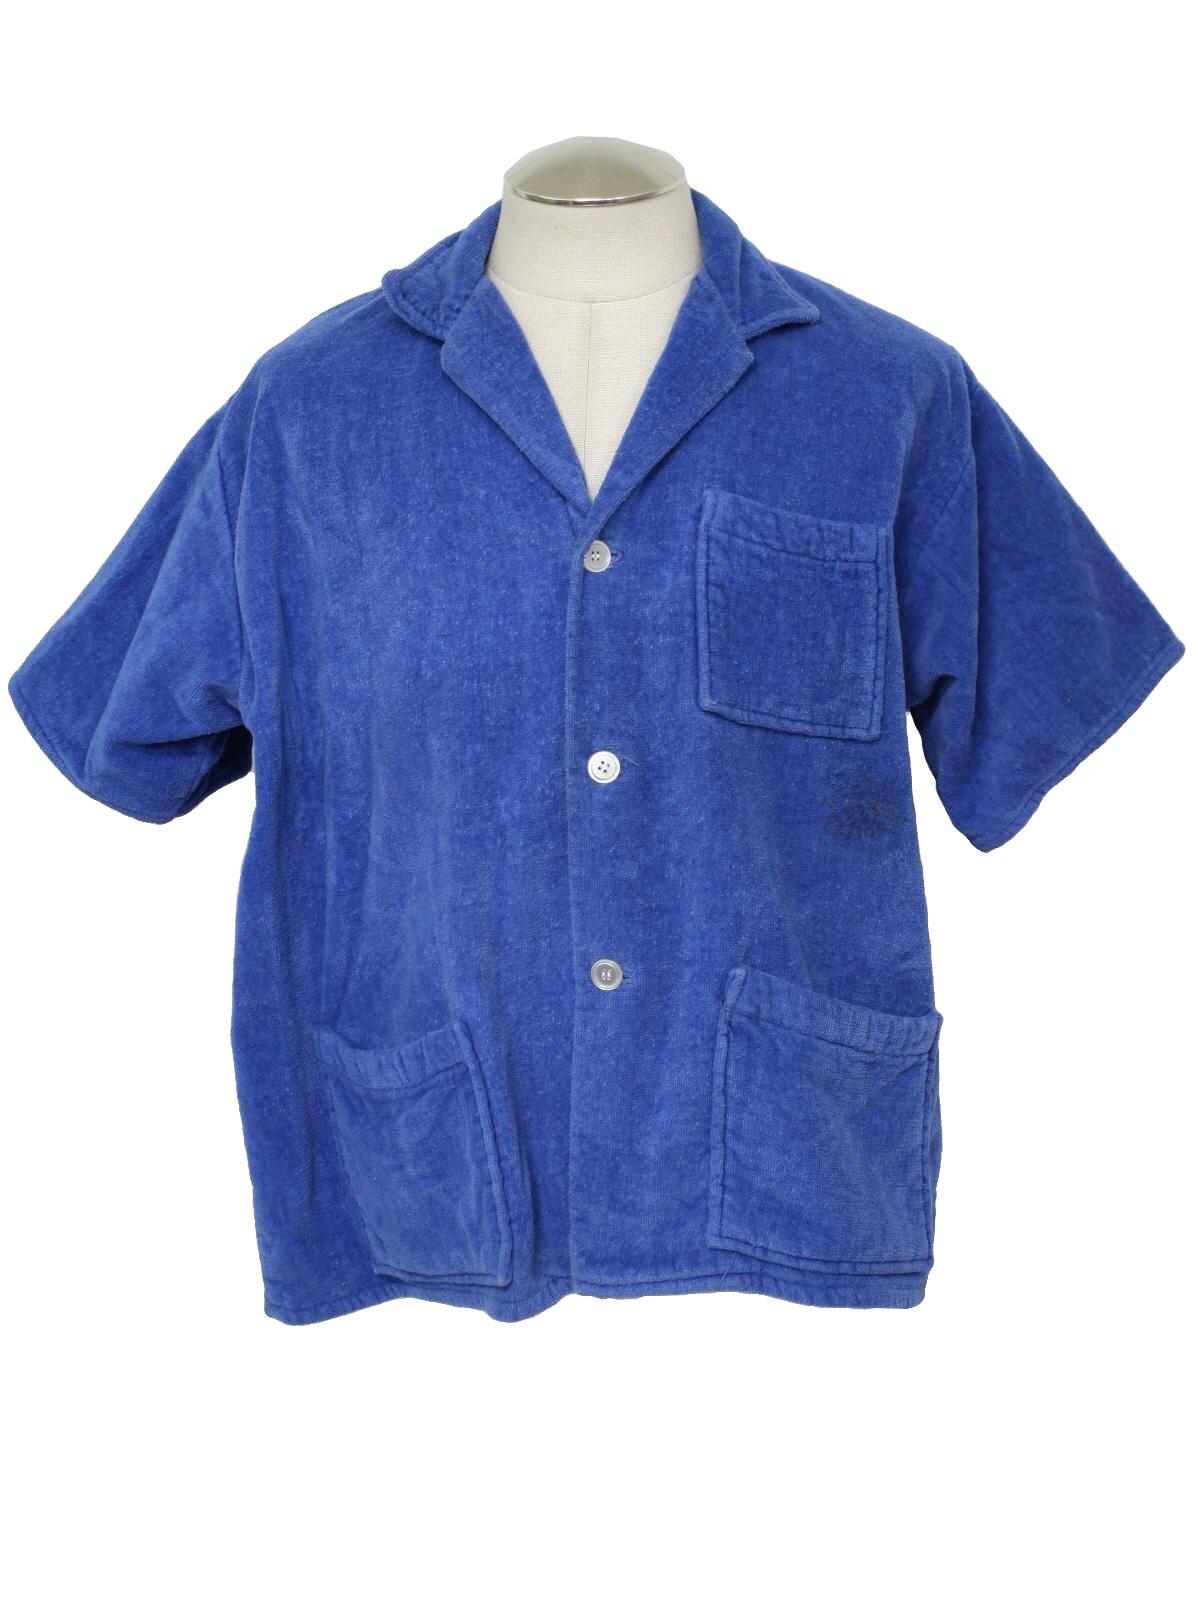 60s Retro Shirt 60s Brent Mens Short Sleeve Bright